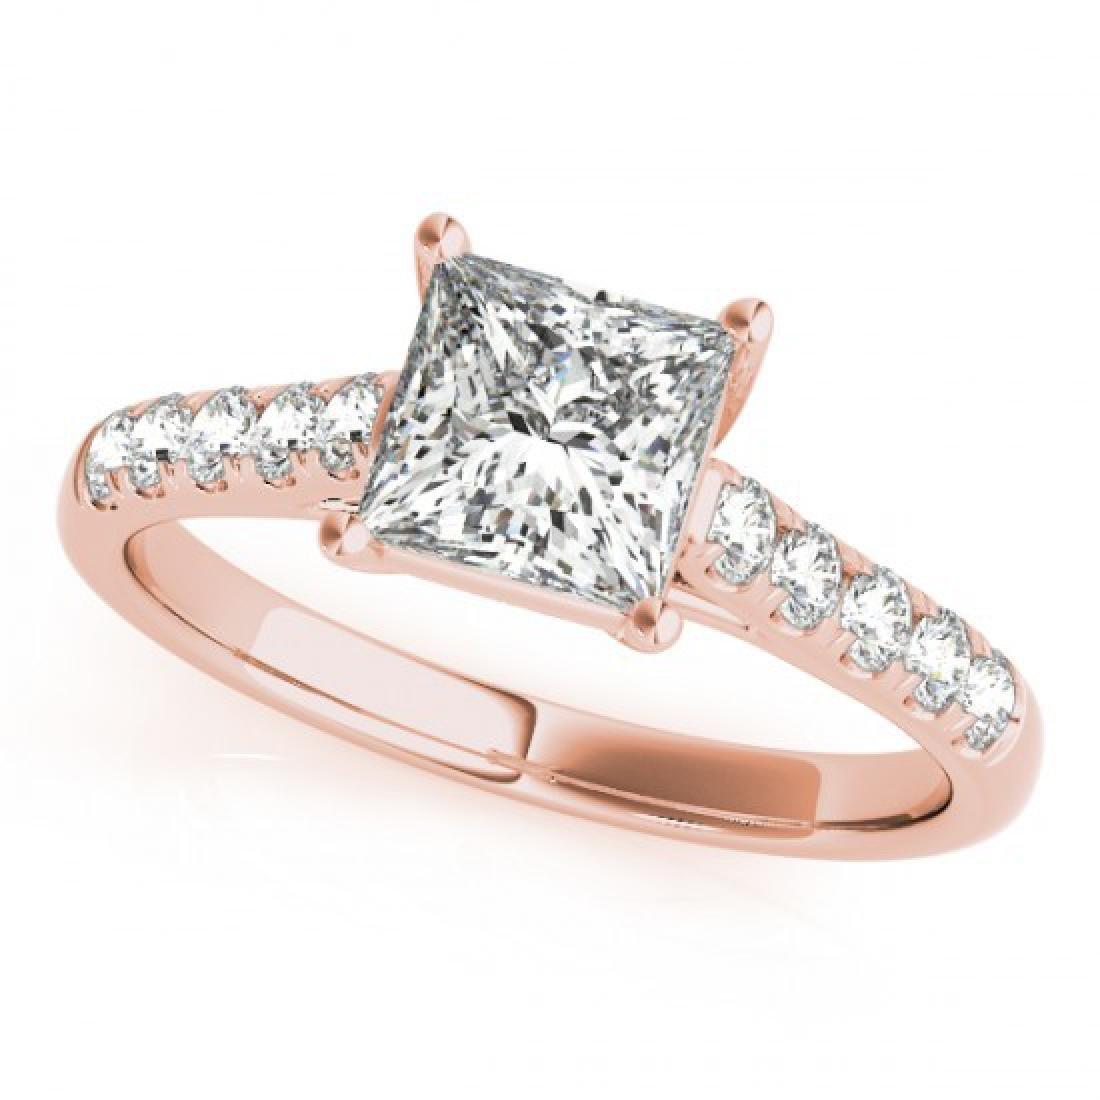 1.3 CTW Certified VS/SI Princess Diamond Ring 14K Rose